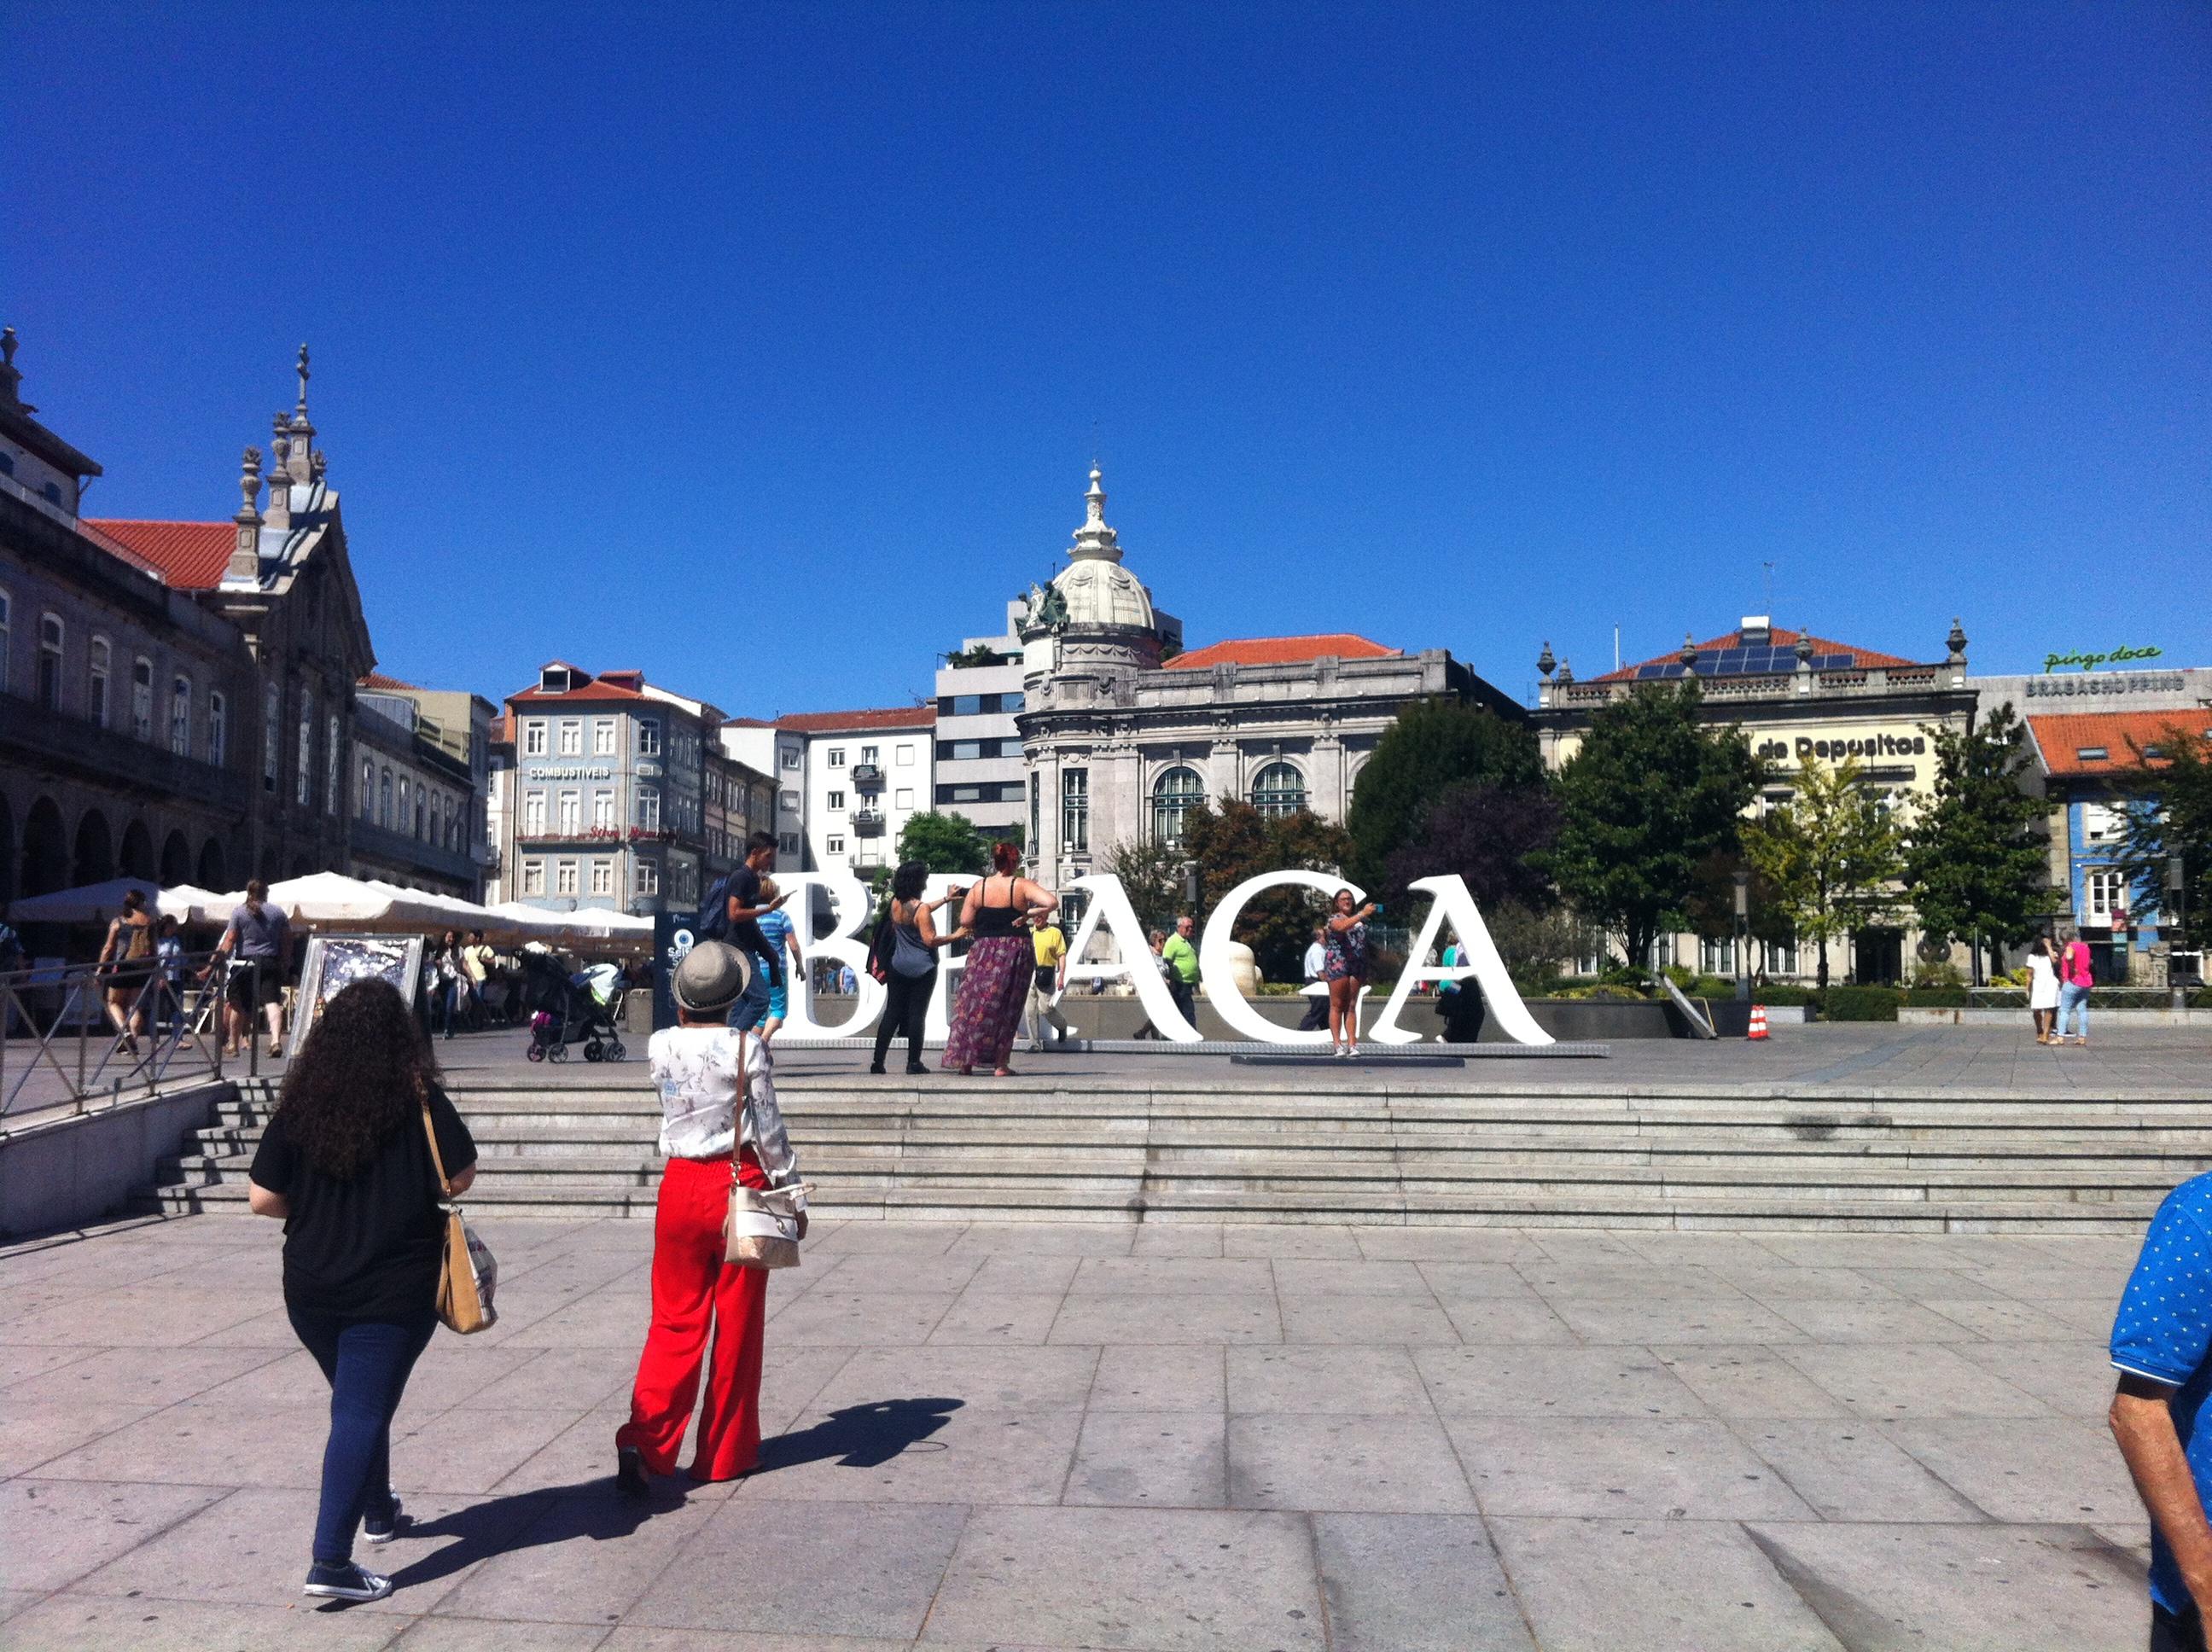 Cara Madonna, e se visitasse Braga?